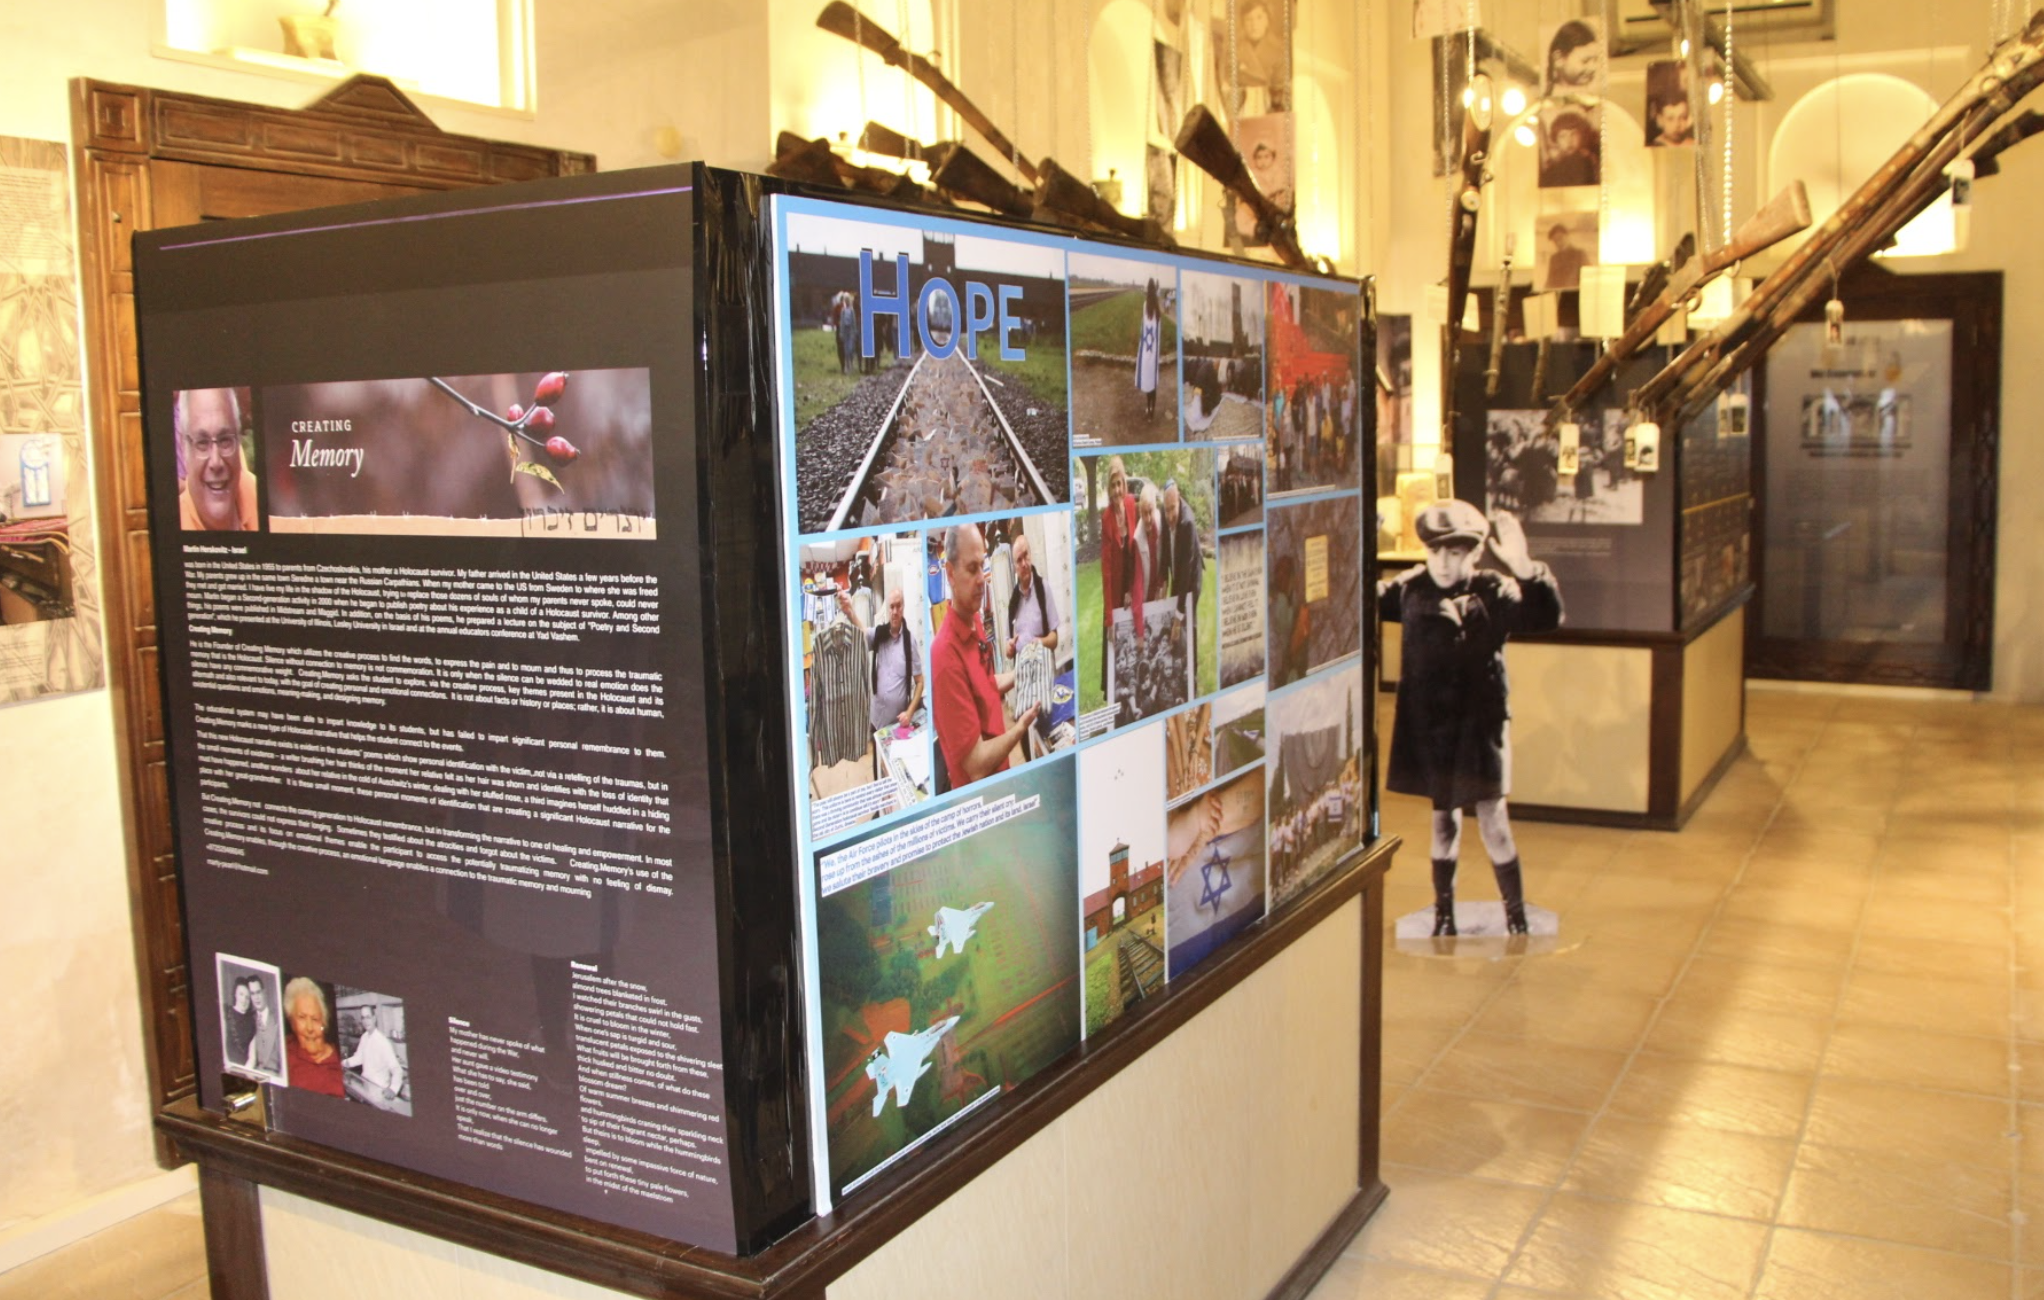 Holocaust memorial exhibition opens in Dubai - News   Khaleej Times